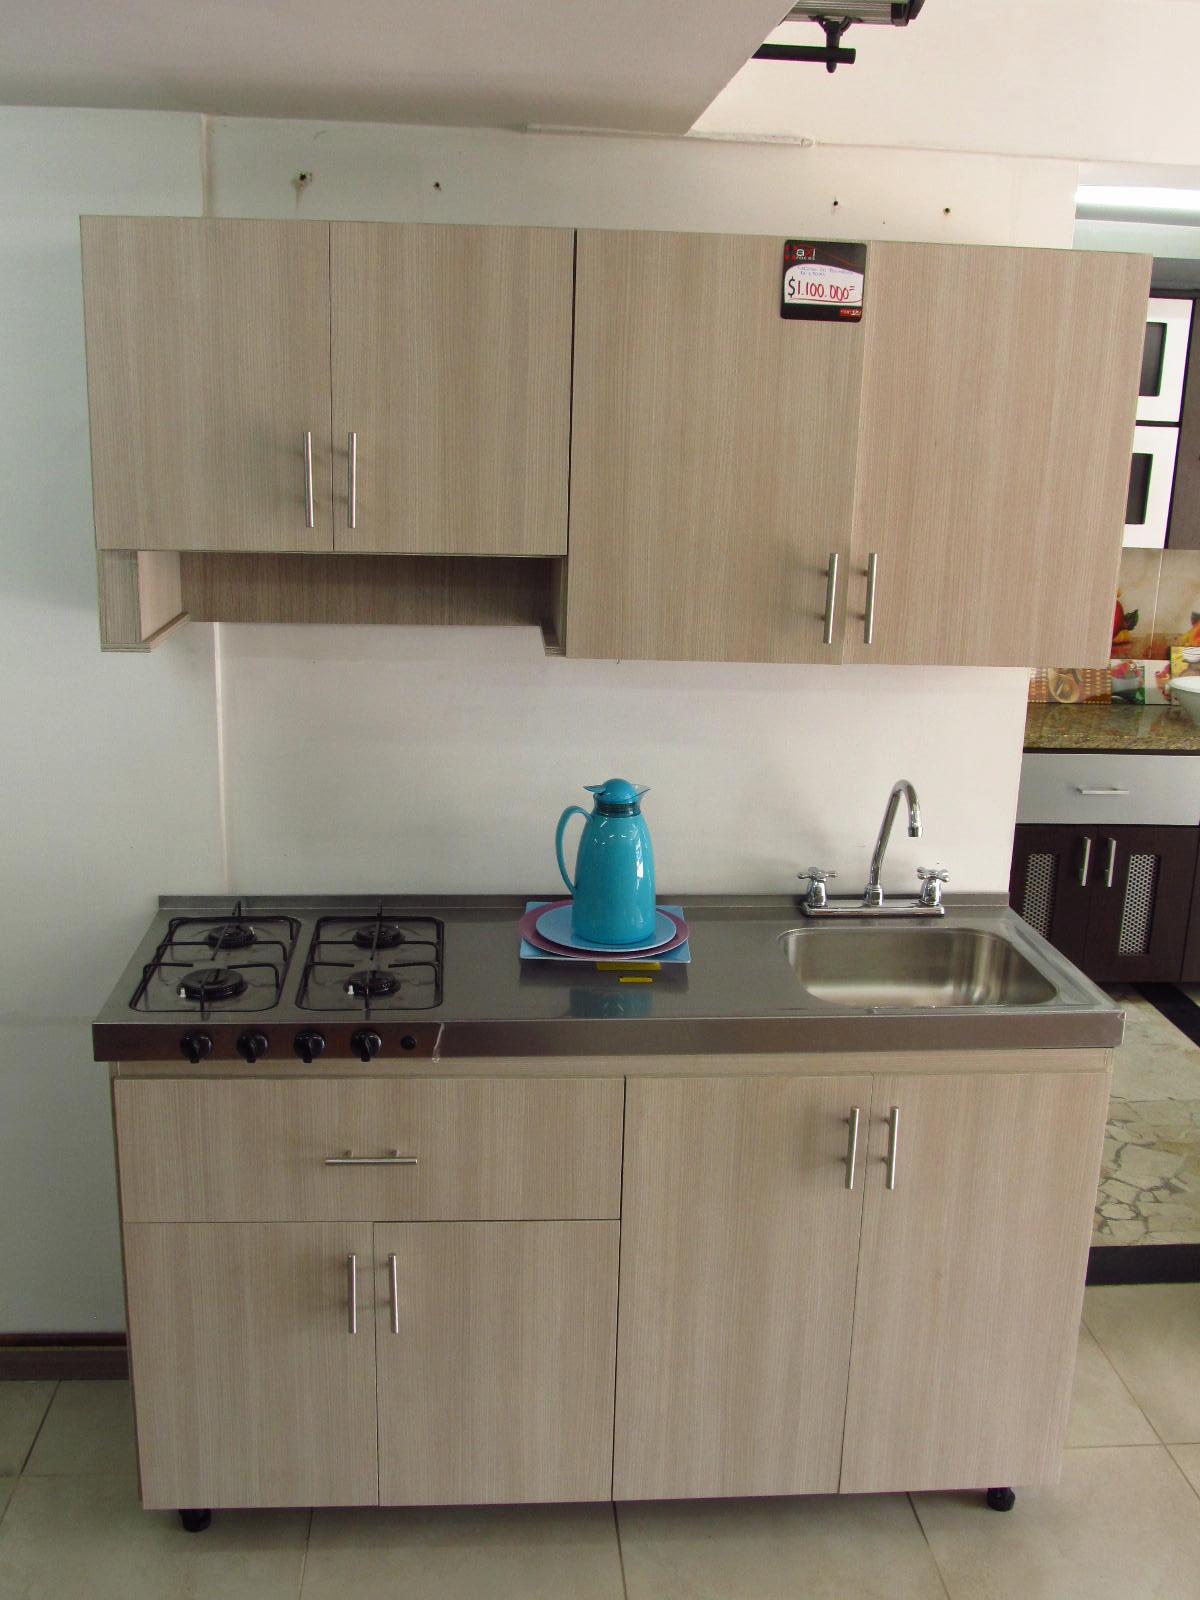 Cocina en acero inoxidable for Cocinas integrales con horno